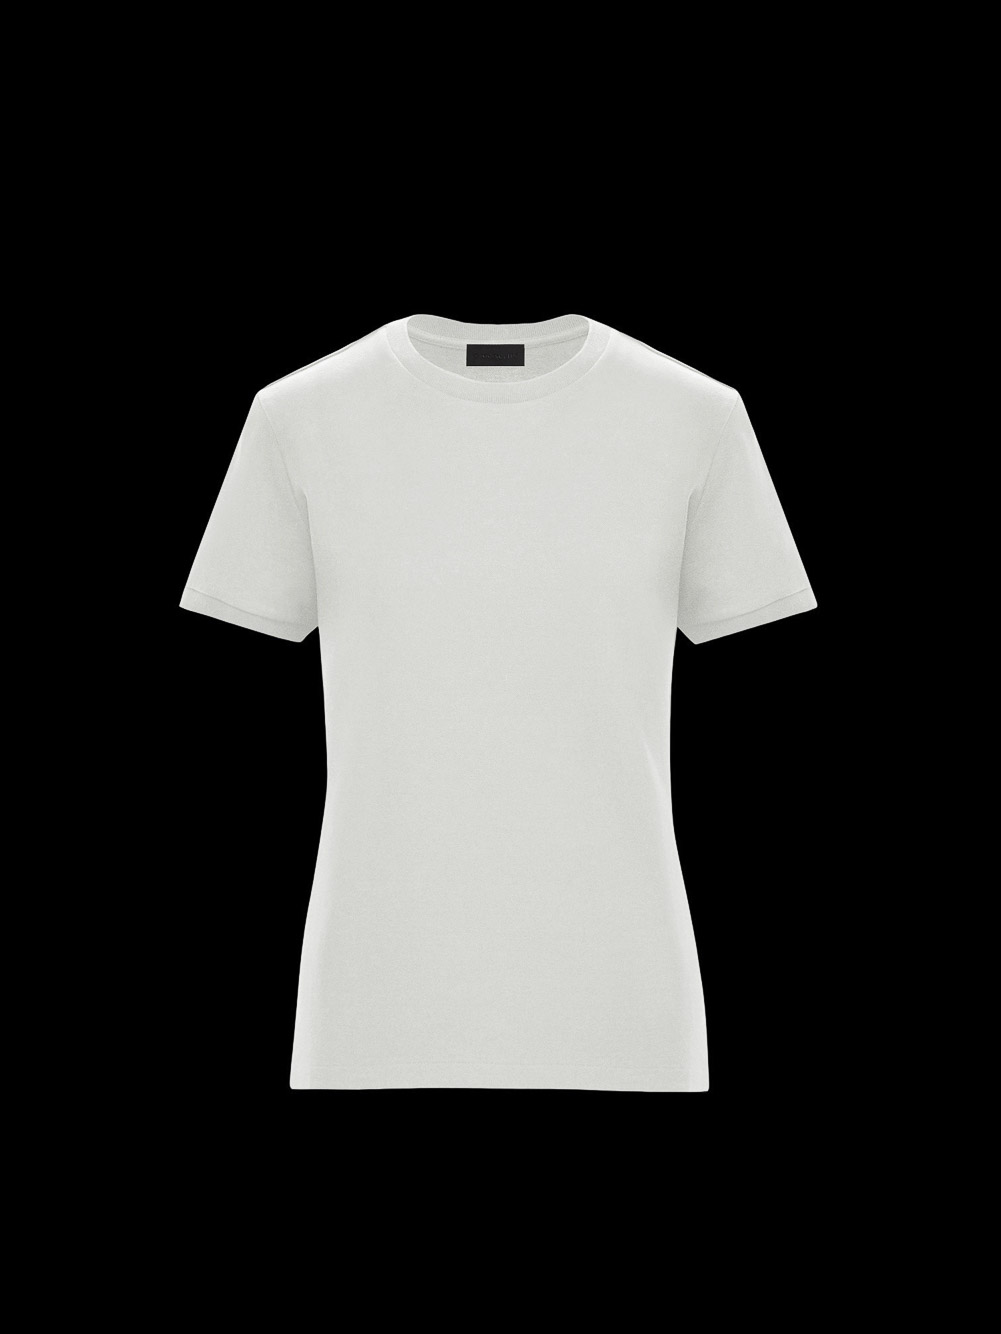 MONCLER Μπλούζα T-shirt 0938C7B010829H8-034 ΛΕΥΚΟ